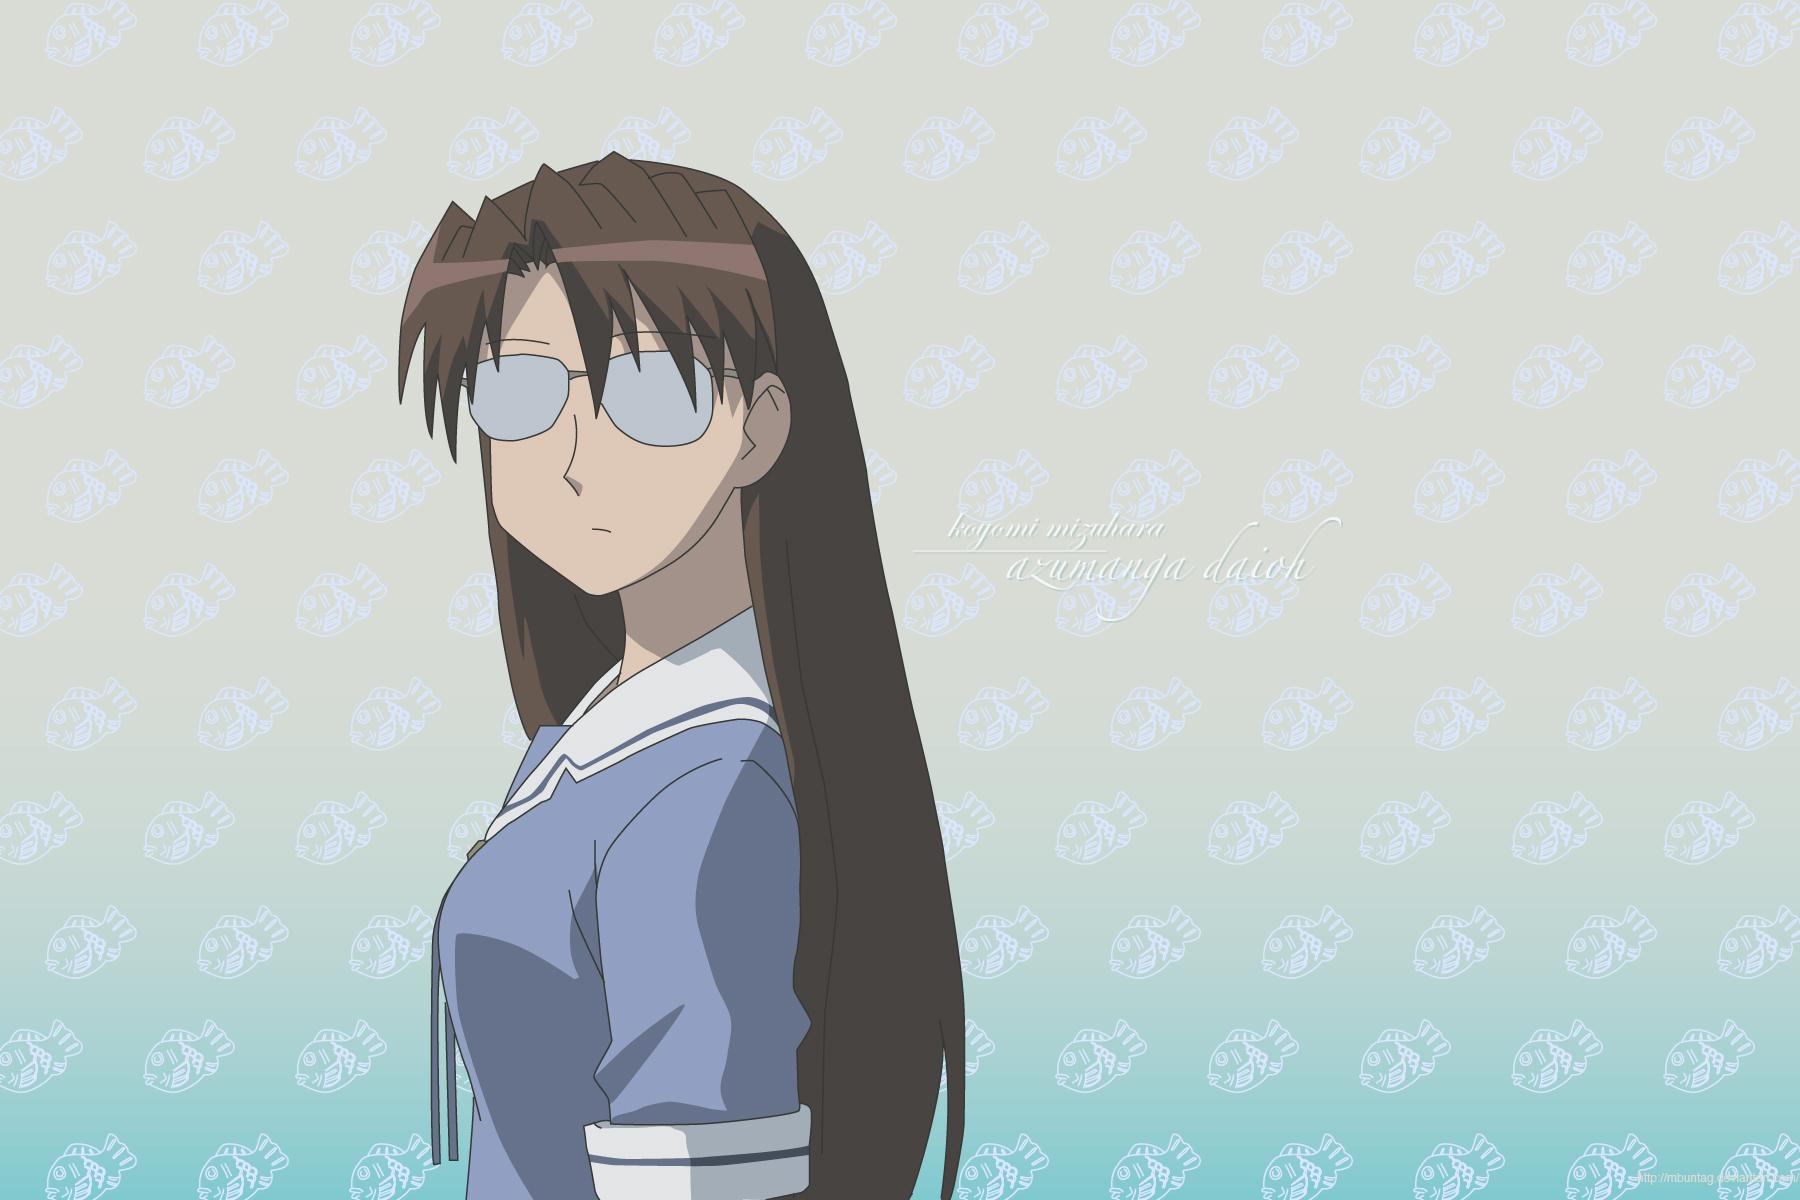 Koyomi Mizuhara, aka Yomi, comments on some suspicious photos from the Summer Break episode of the Azumanga Daioh anime adaptation